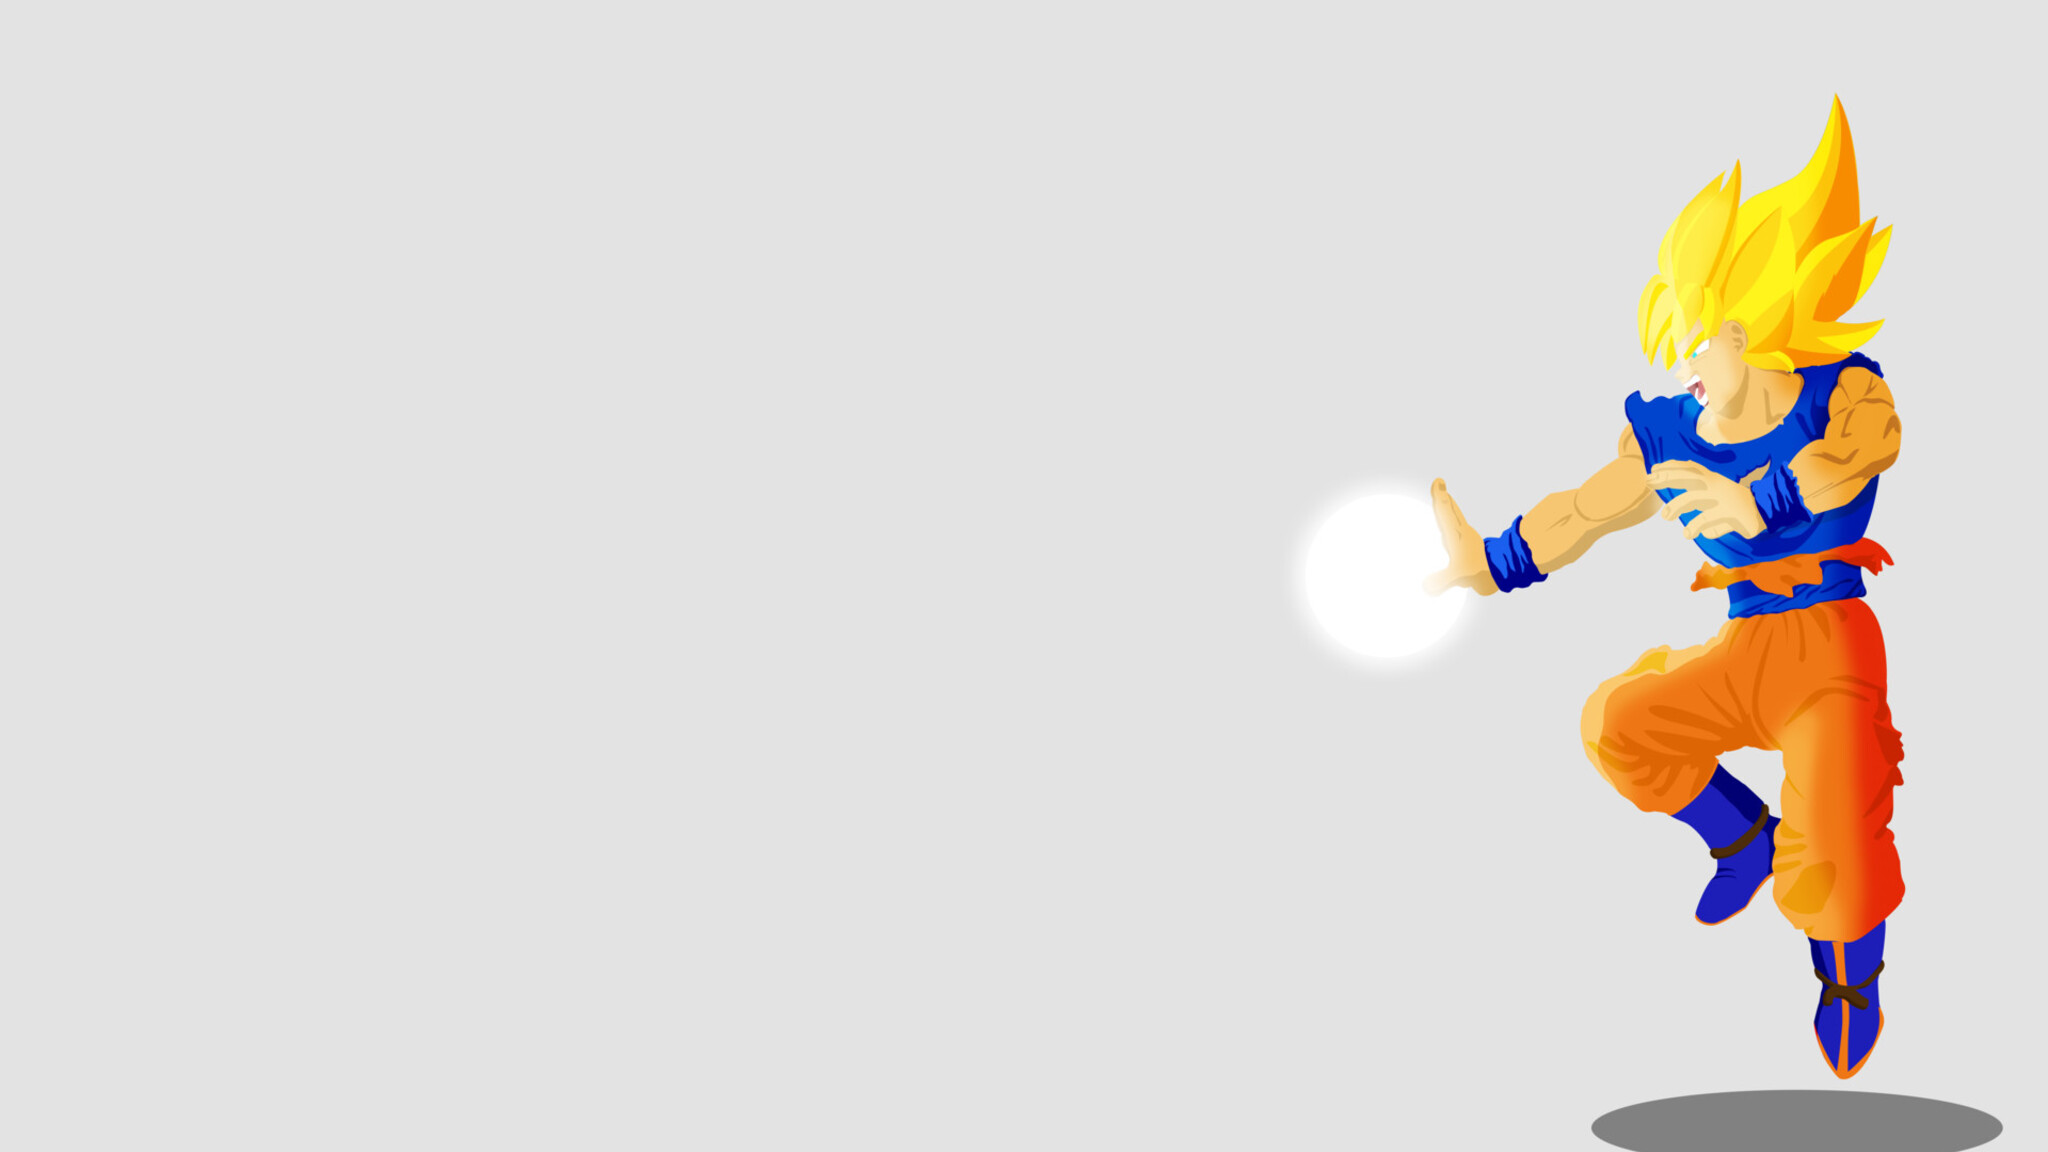 2048x1152 Dragon Ball Z Illustration Goku 2048x1152 ...